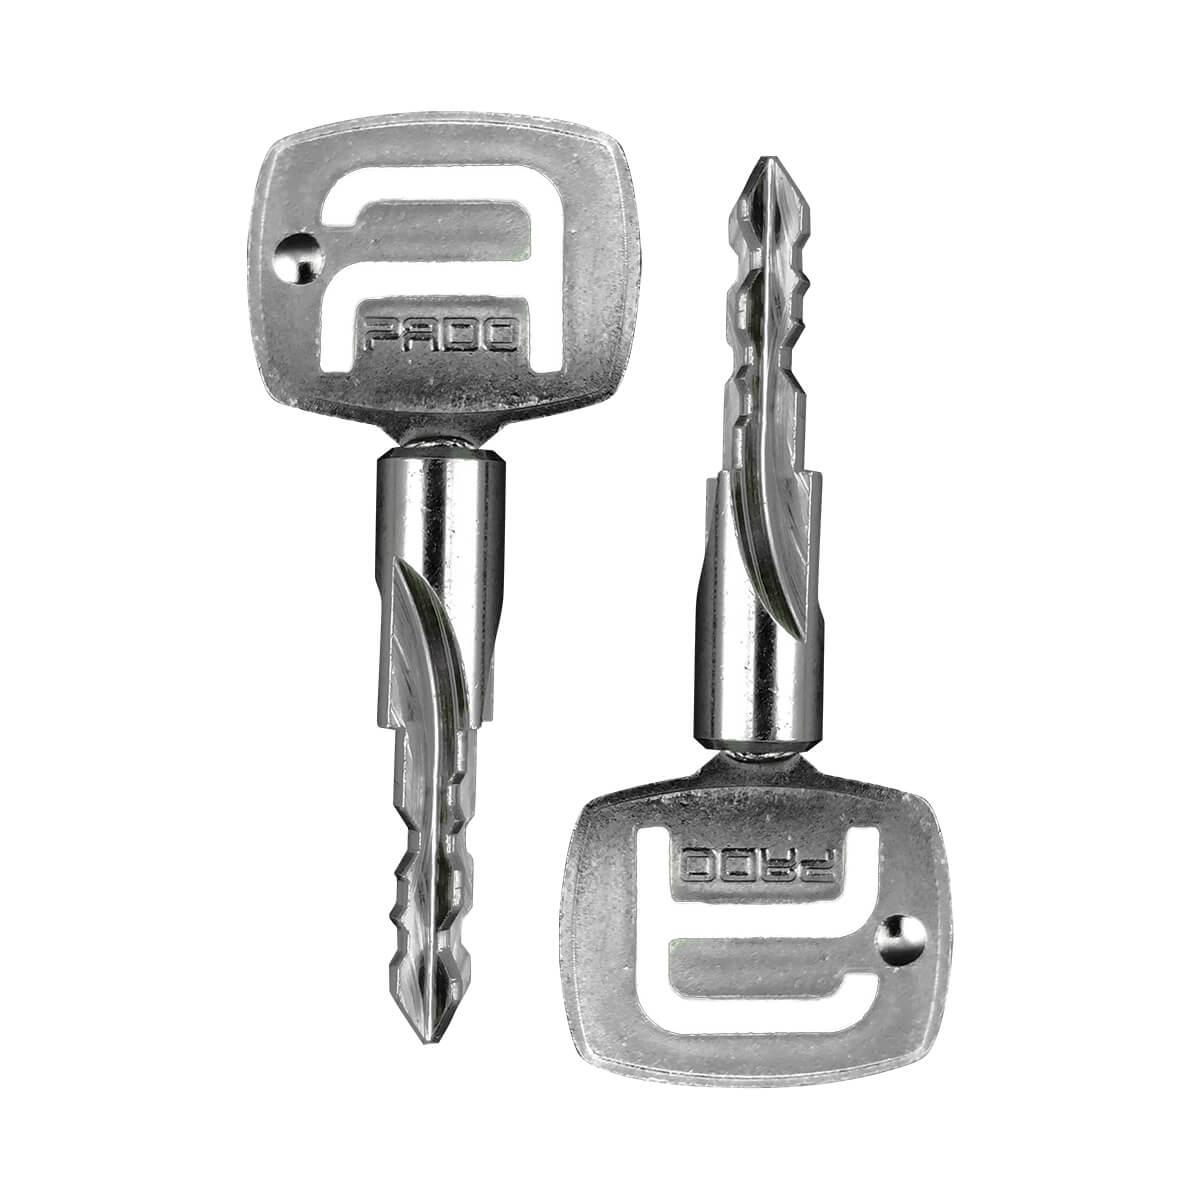 Cadeado Chave Tetra 50mm LT-T50 - Pado